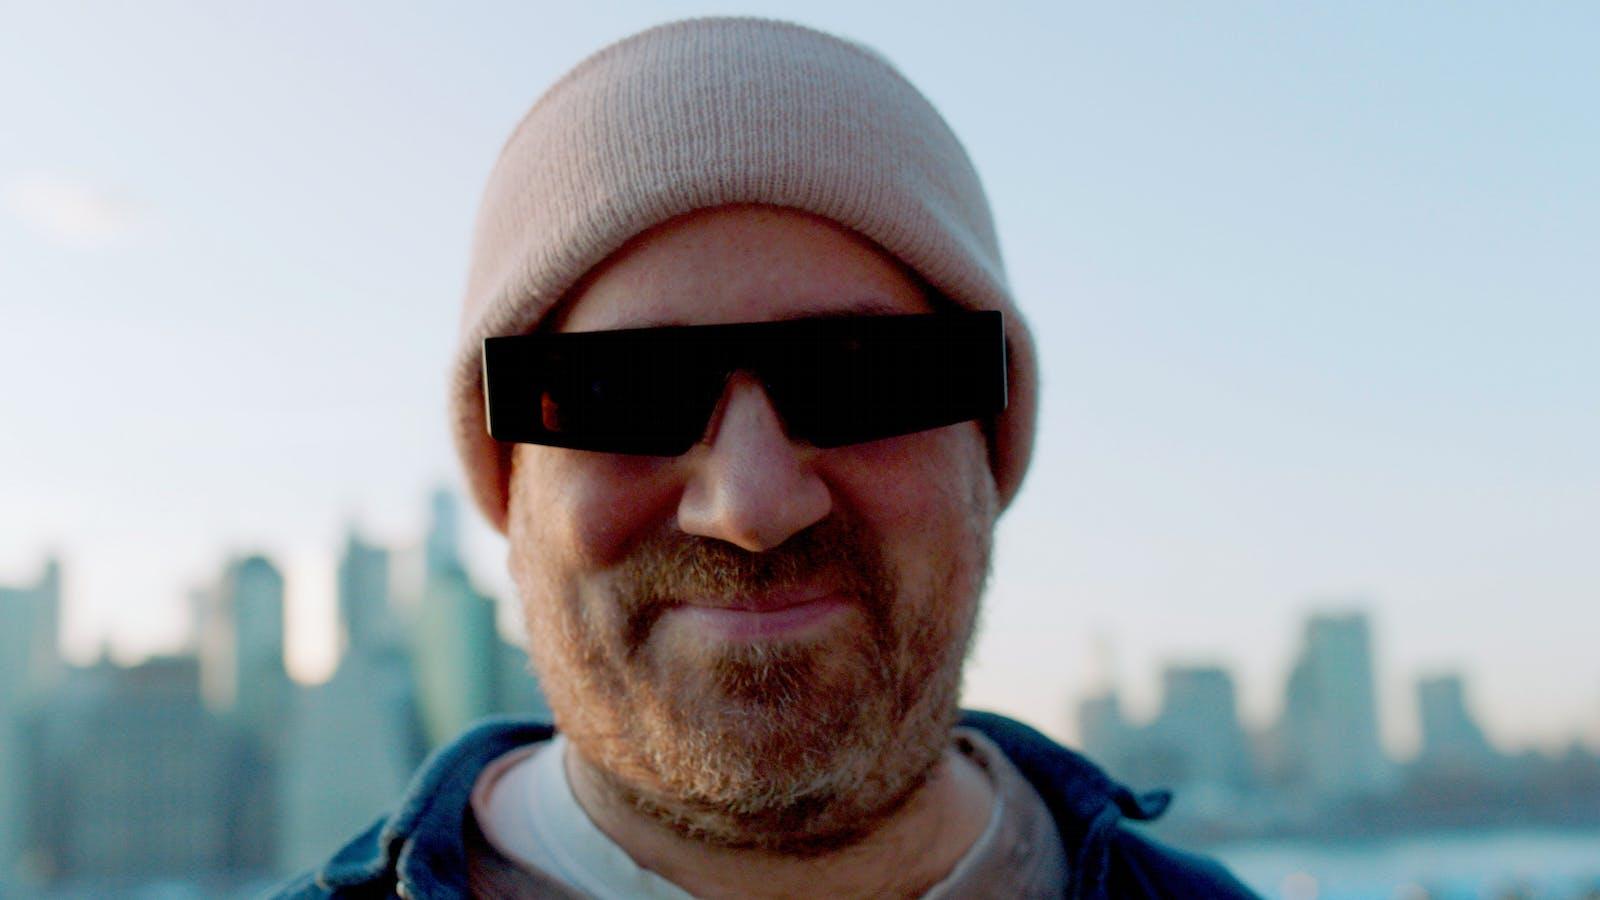 Zach Lieberman, a developer, wearing Snap's AR Spectacles. Photo by Snap